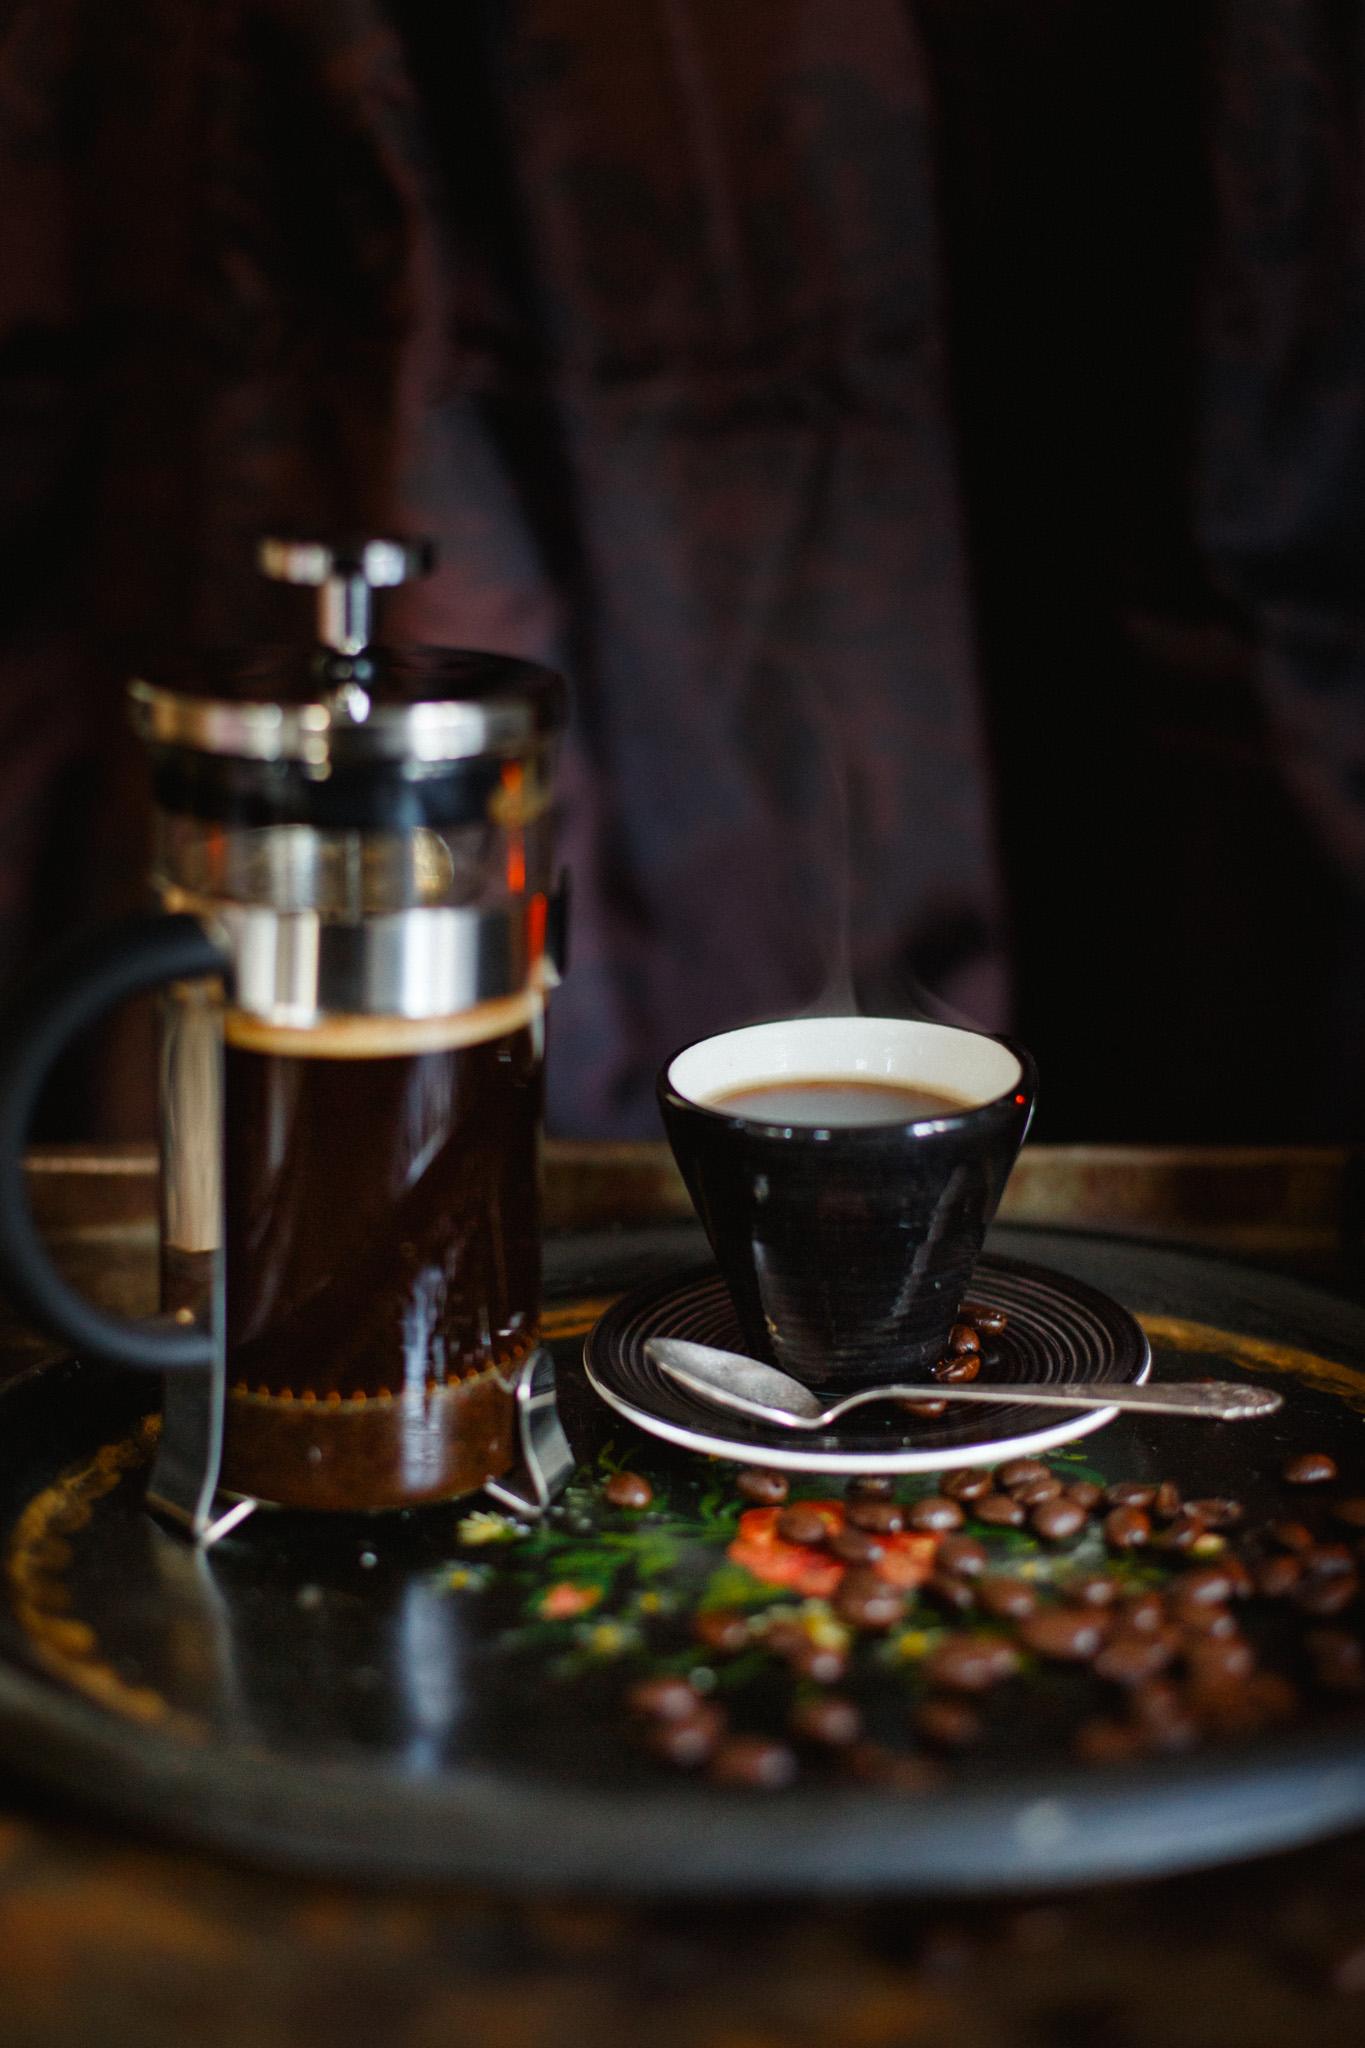 kaffe_josephine_foundation_web-1009.jpg